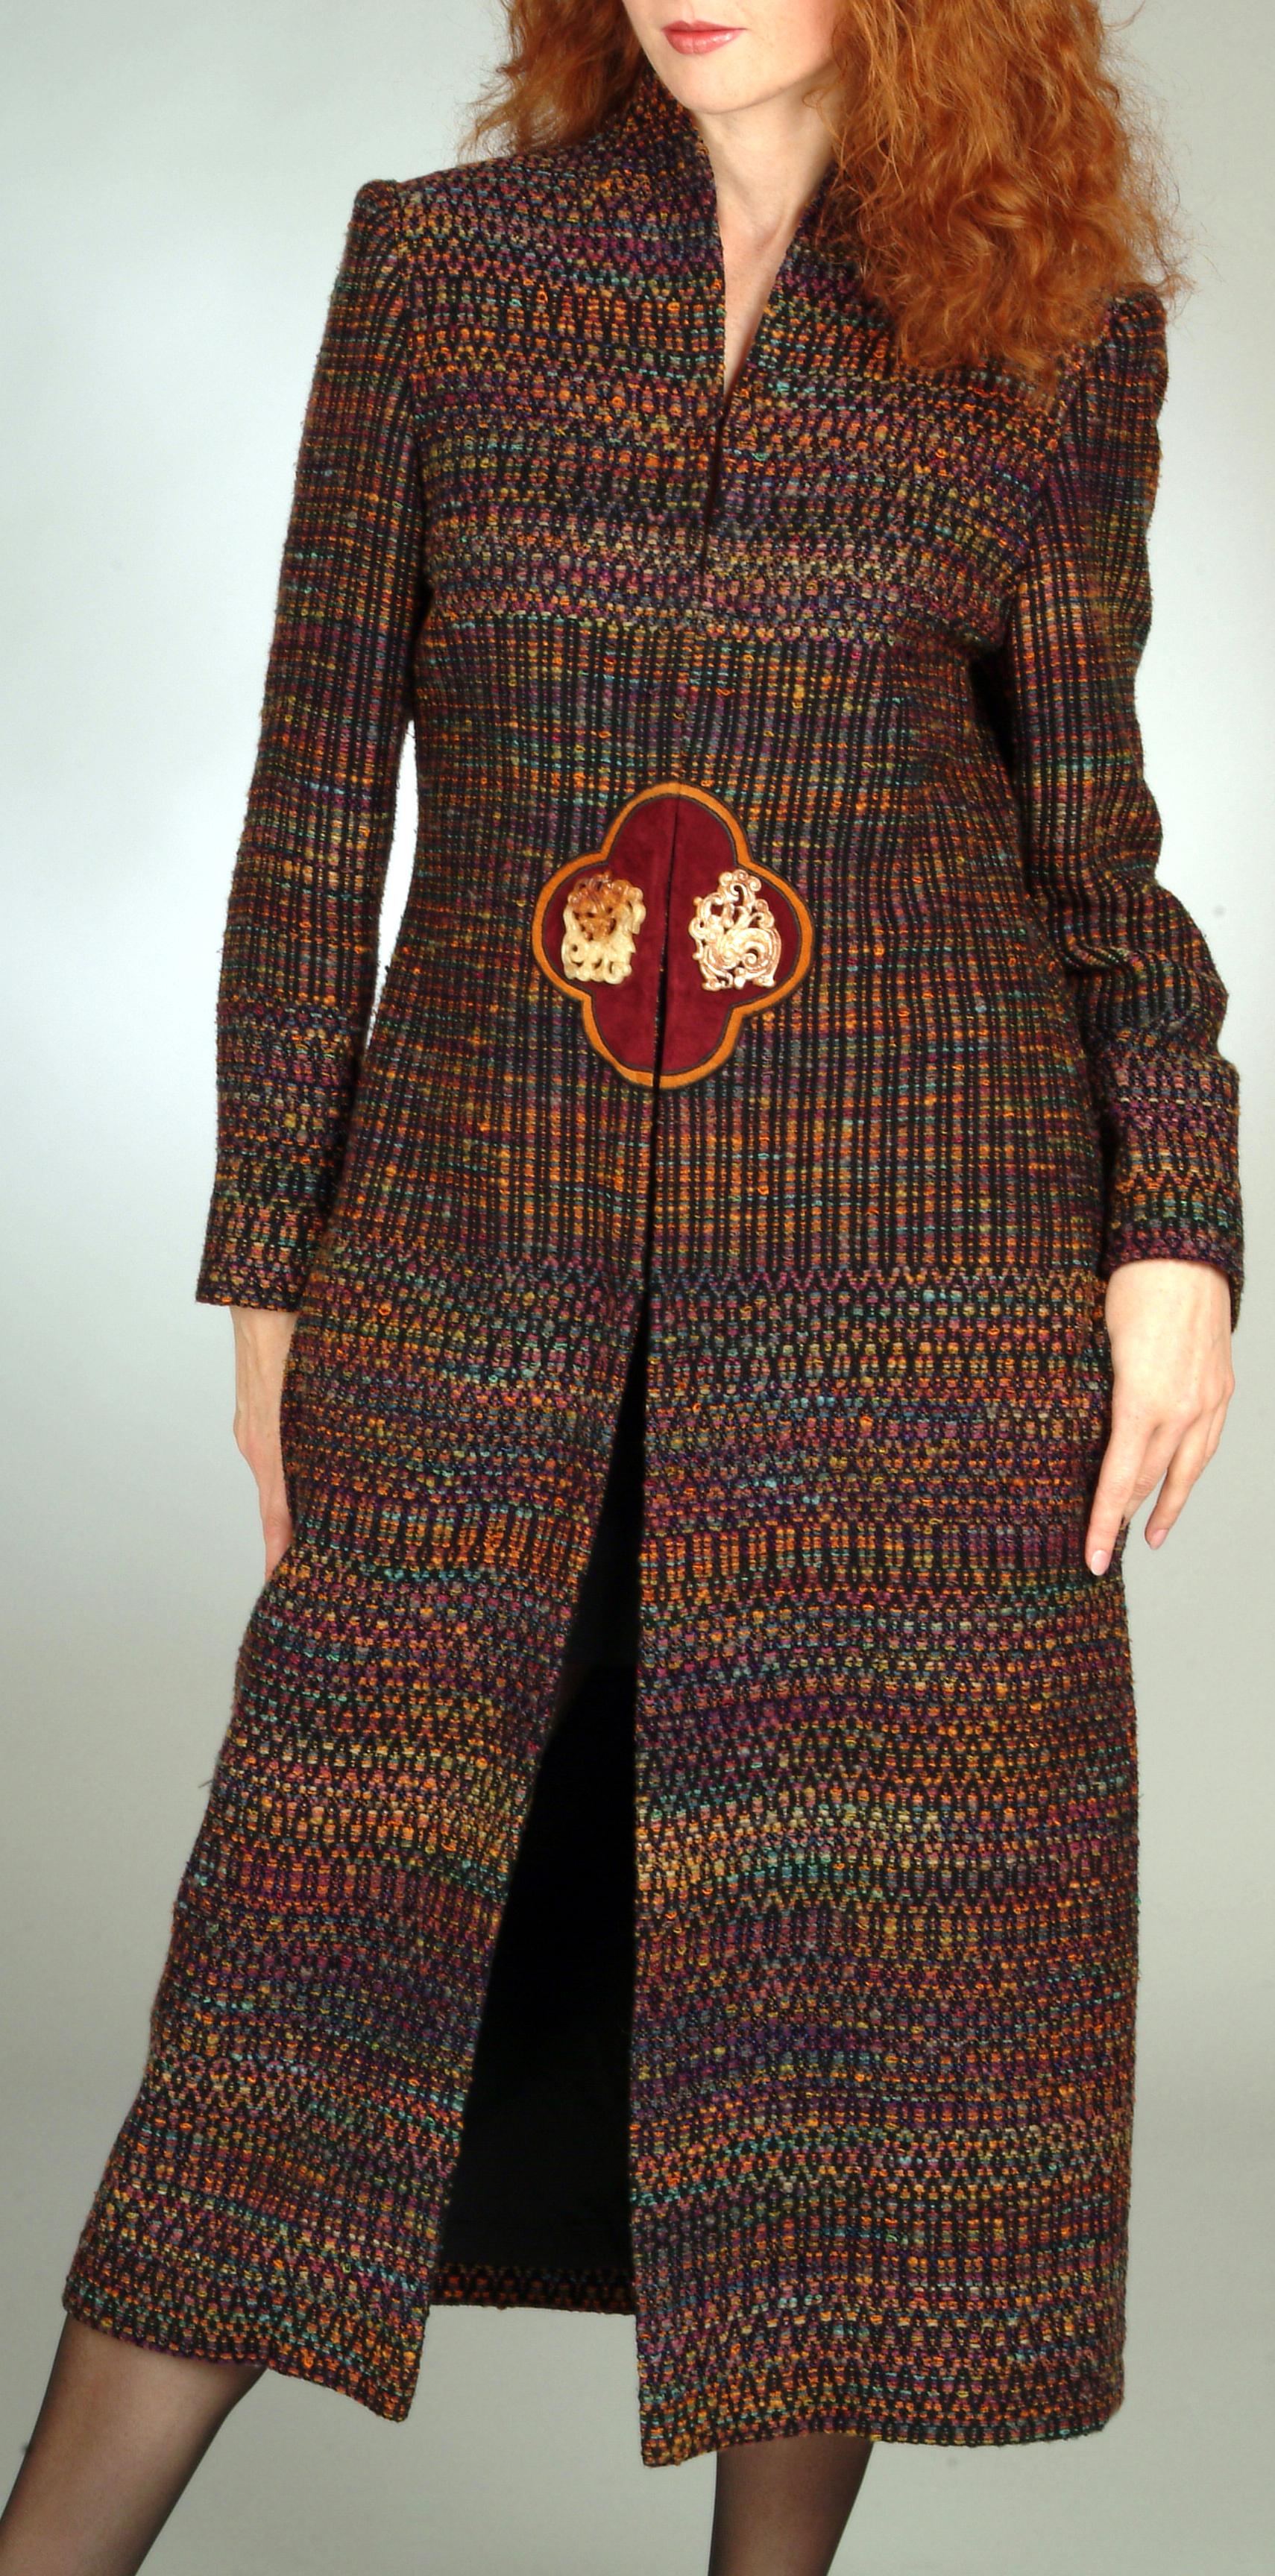 Handwoven Coat, Business Apparel, Kathleen Weir-West 101